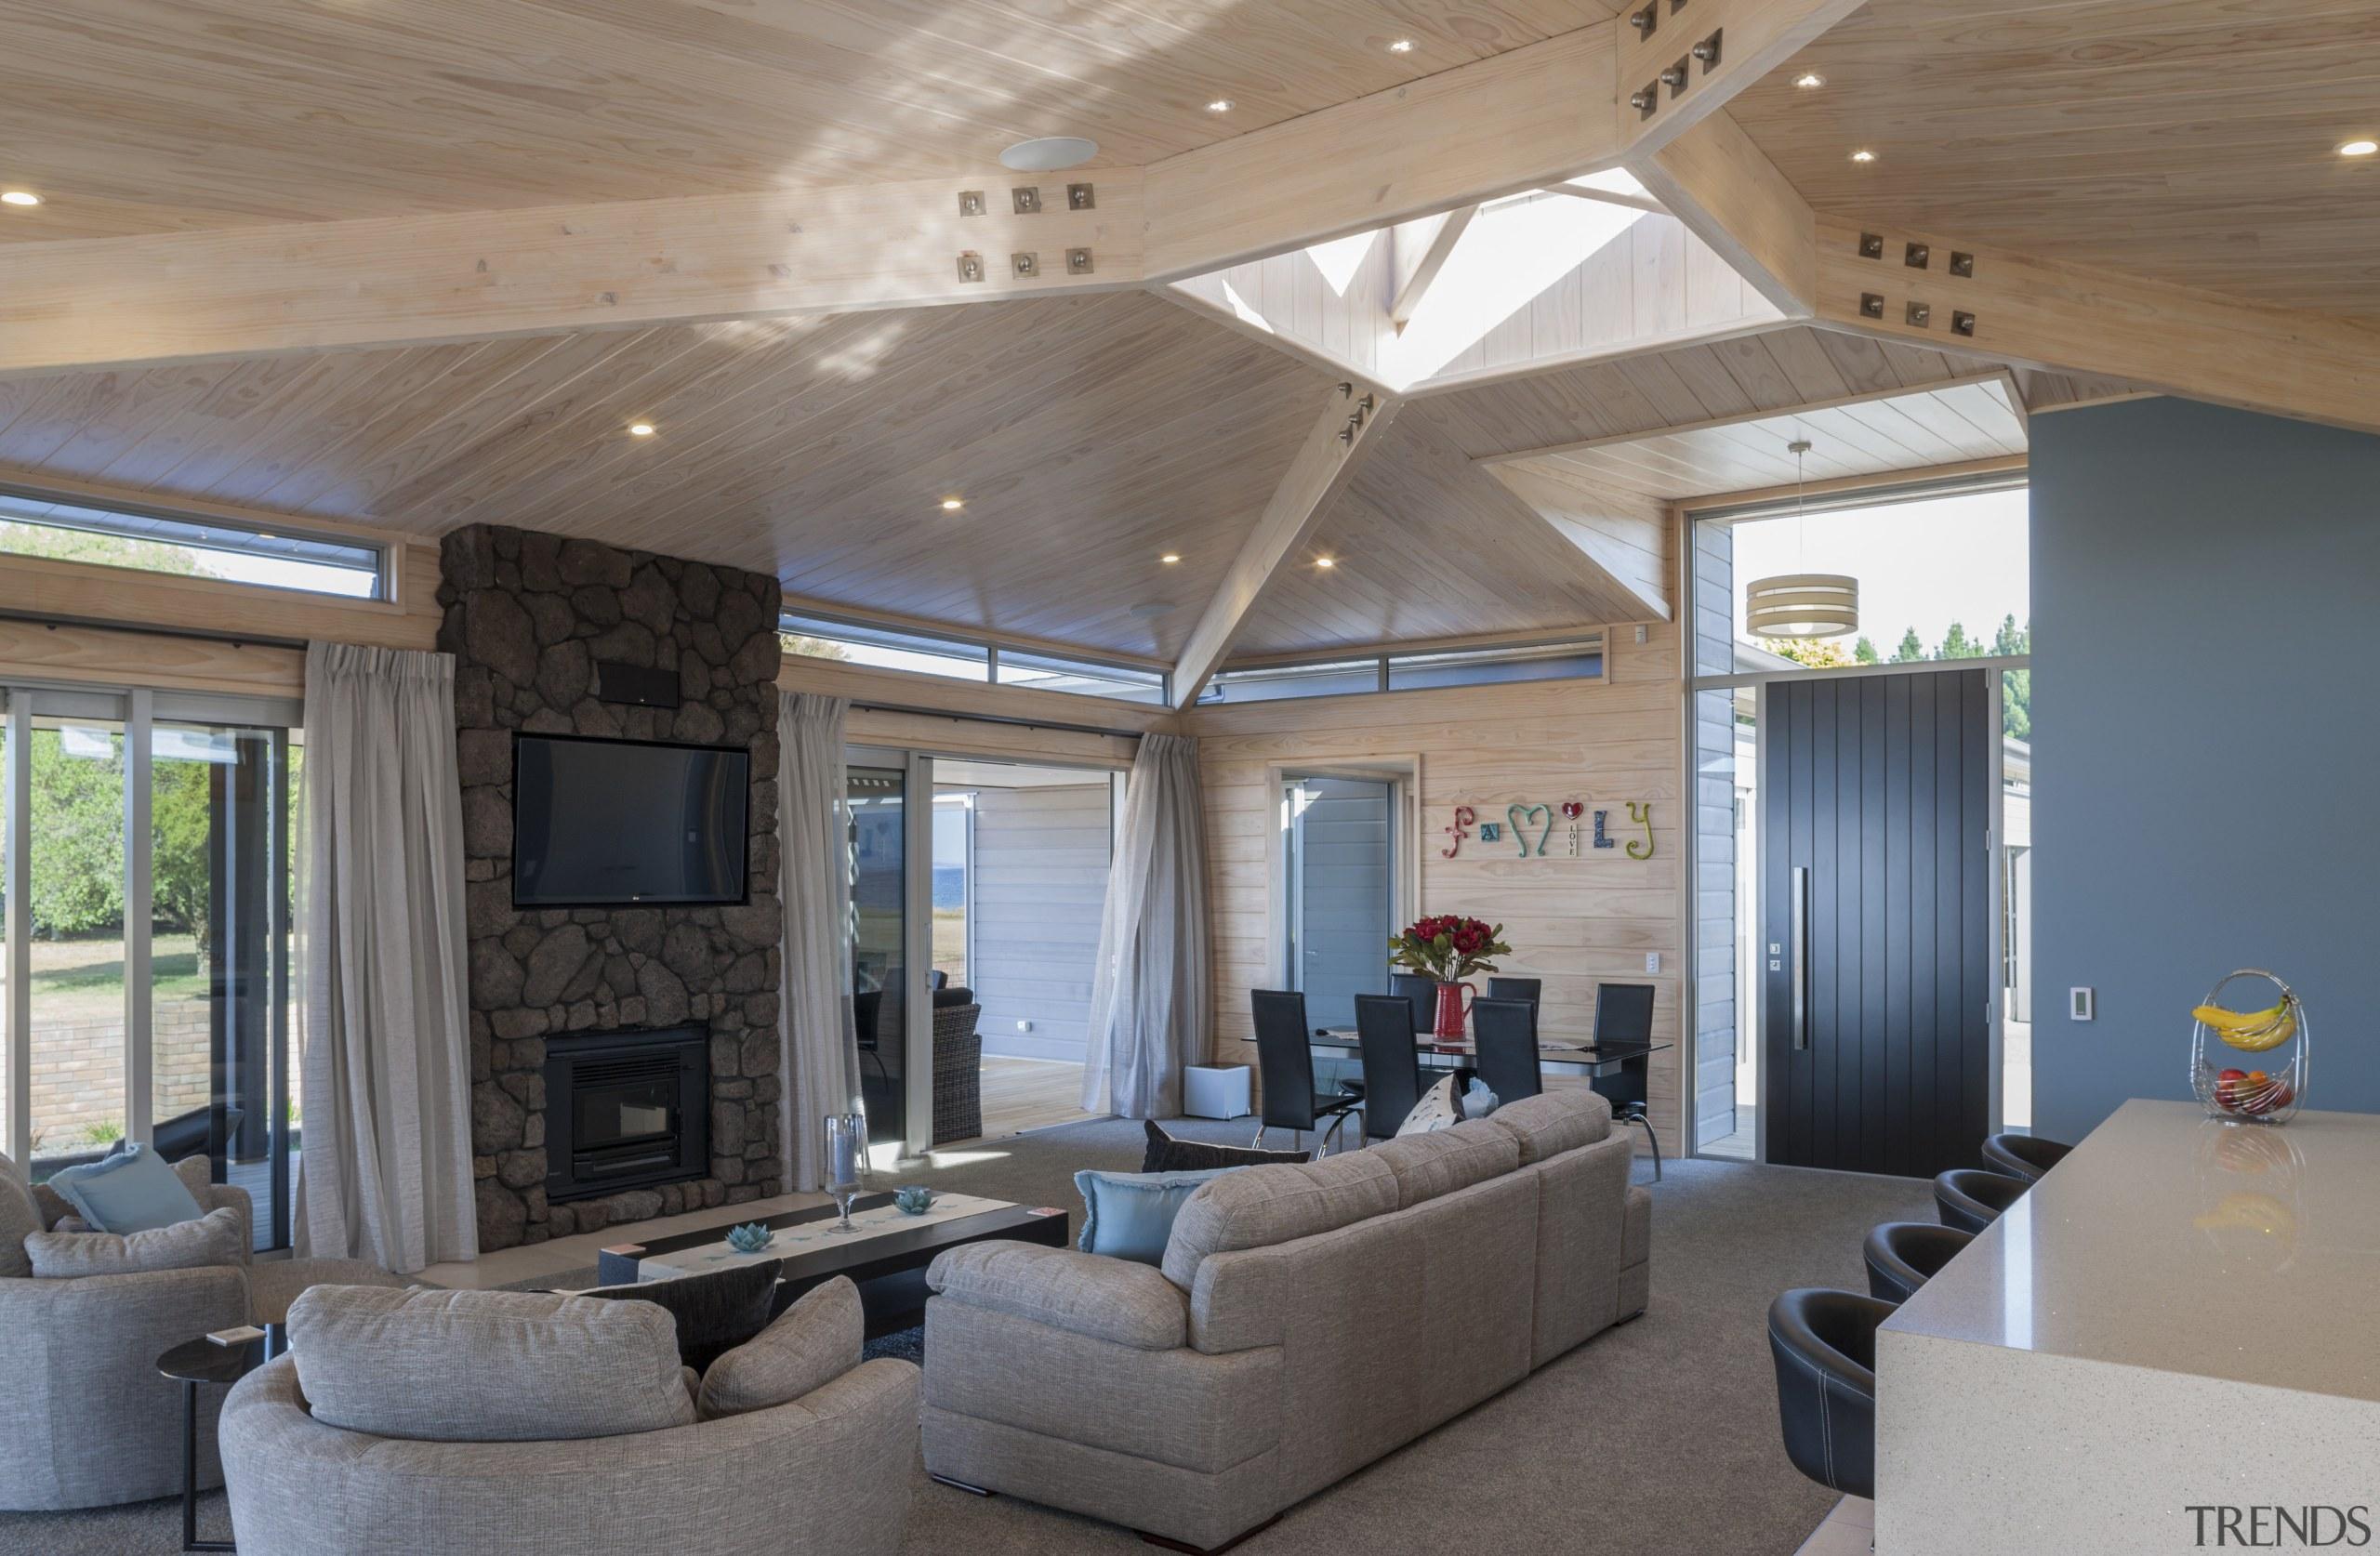 Lockwood Home built by Peter Richards - Lockwood ceiling, daylighting, estate, house, interior design, living room, lobby, real estate, gray